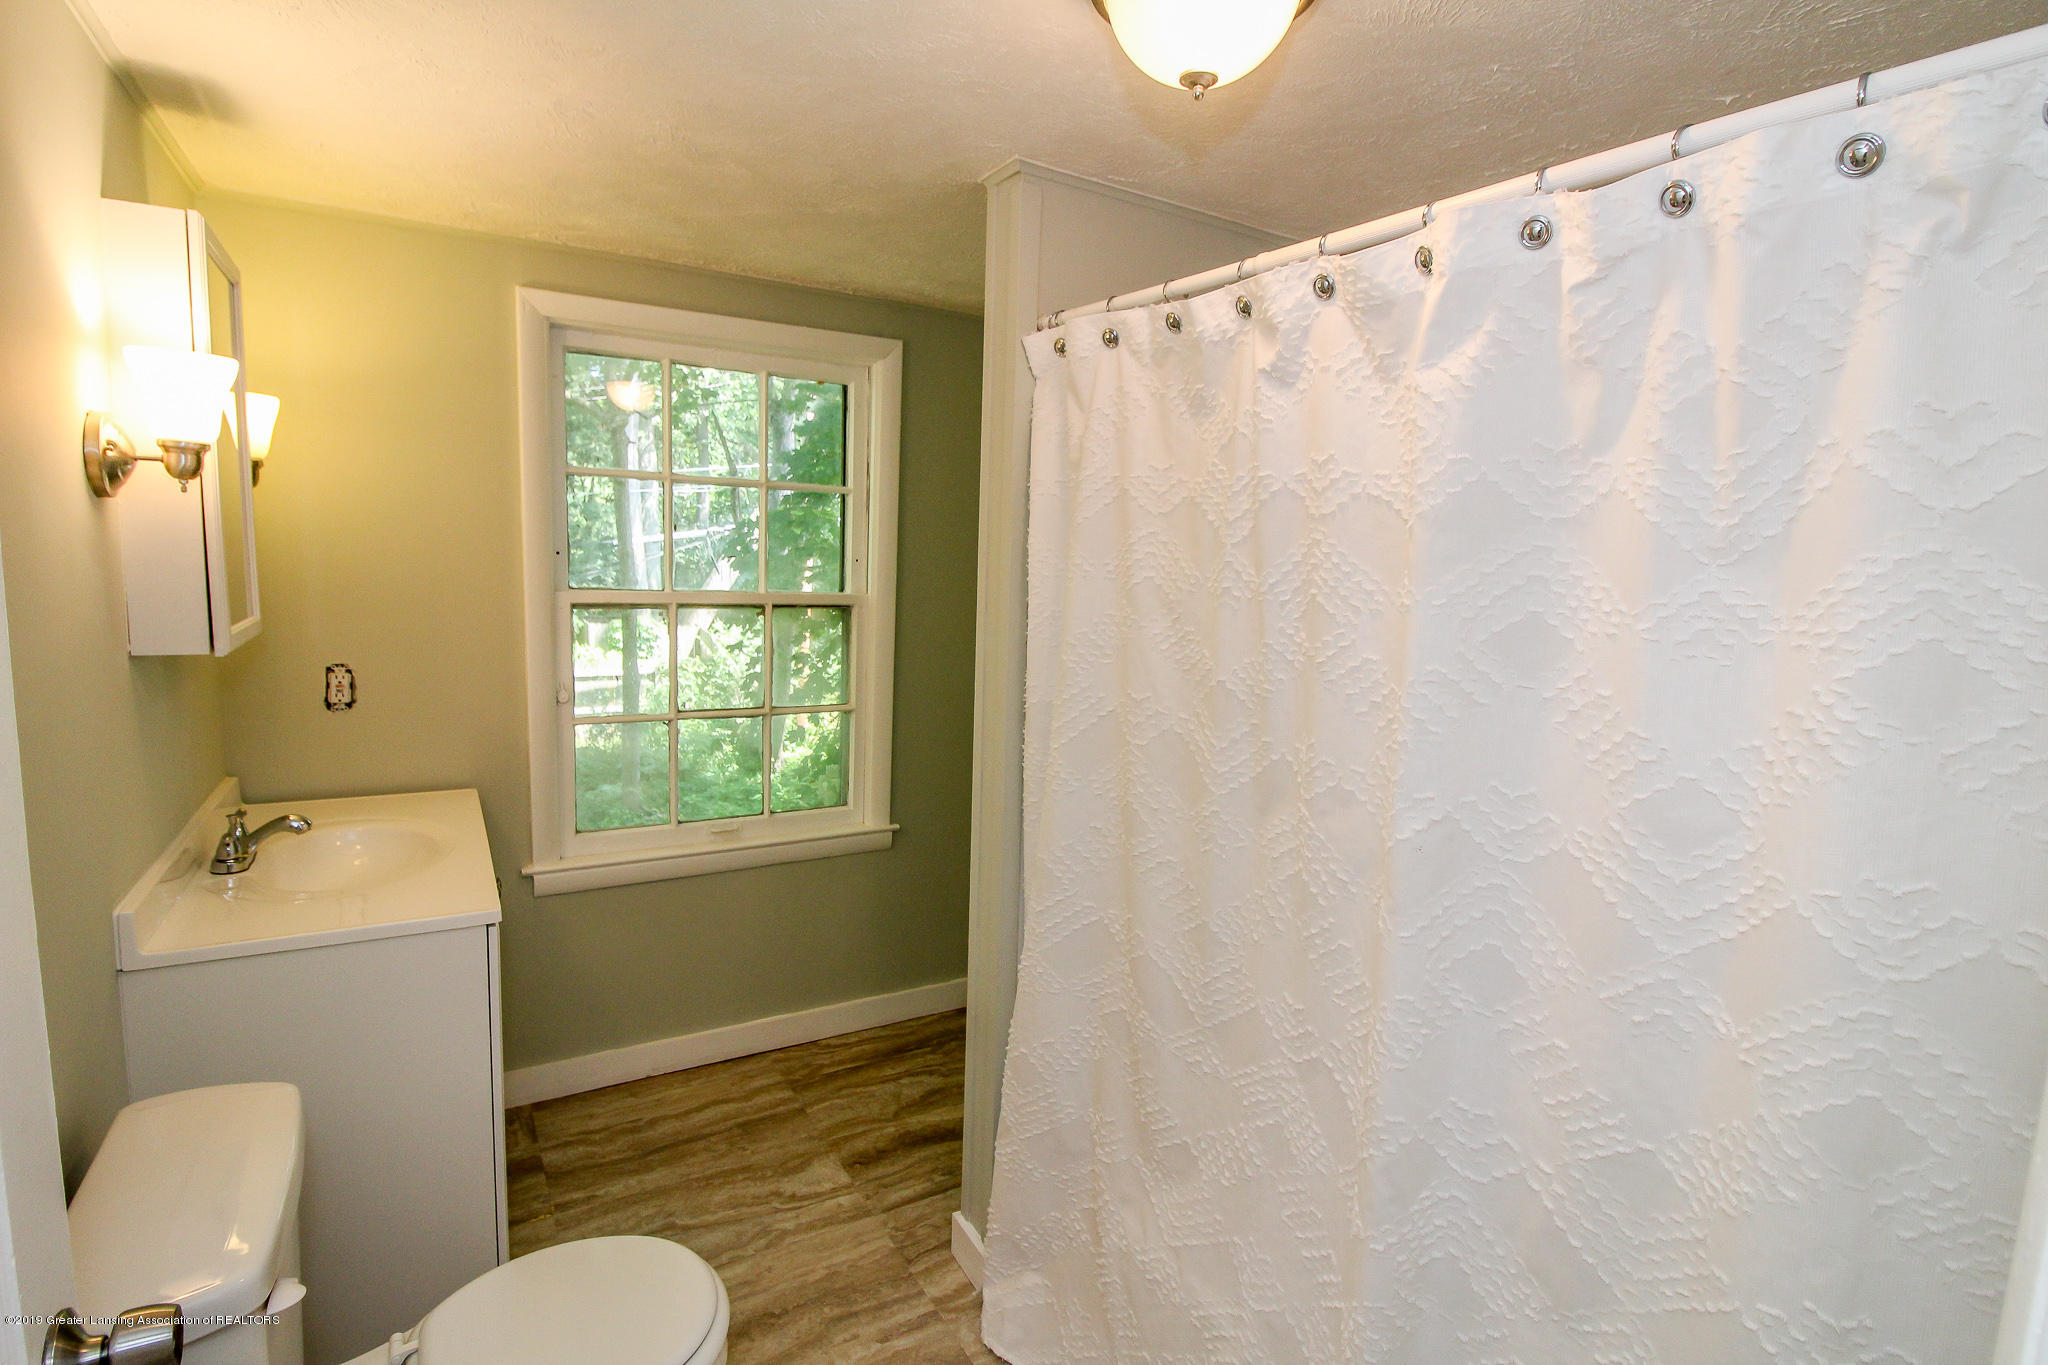 124 Northlawn Ave - 32 Second Floor Bathroom 2 - 26